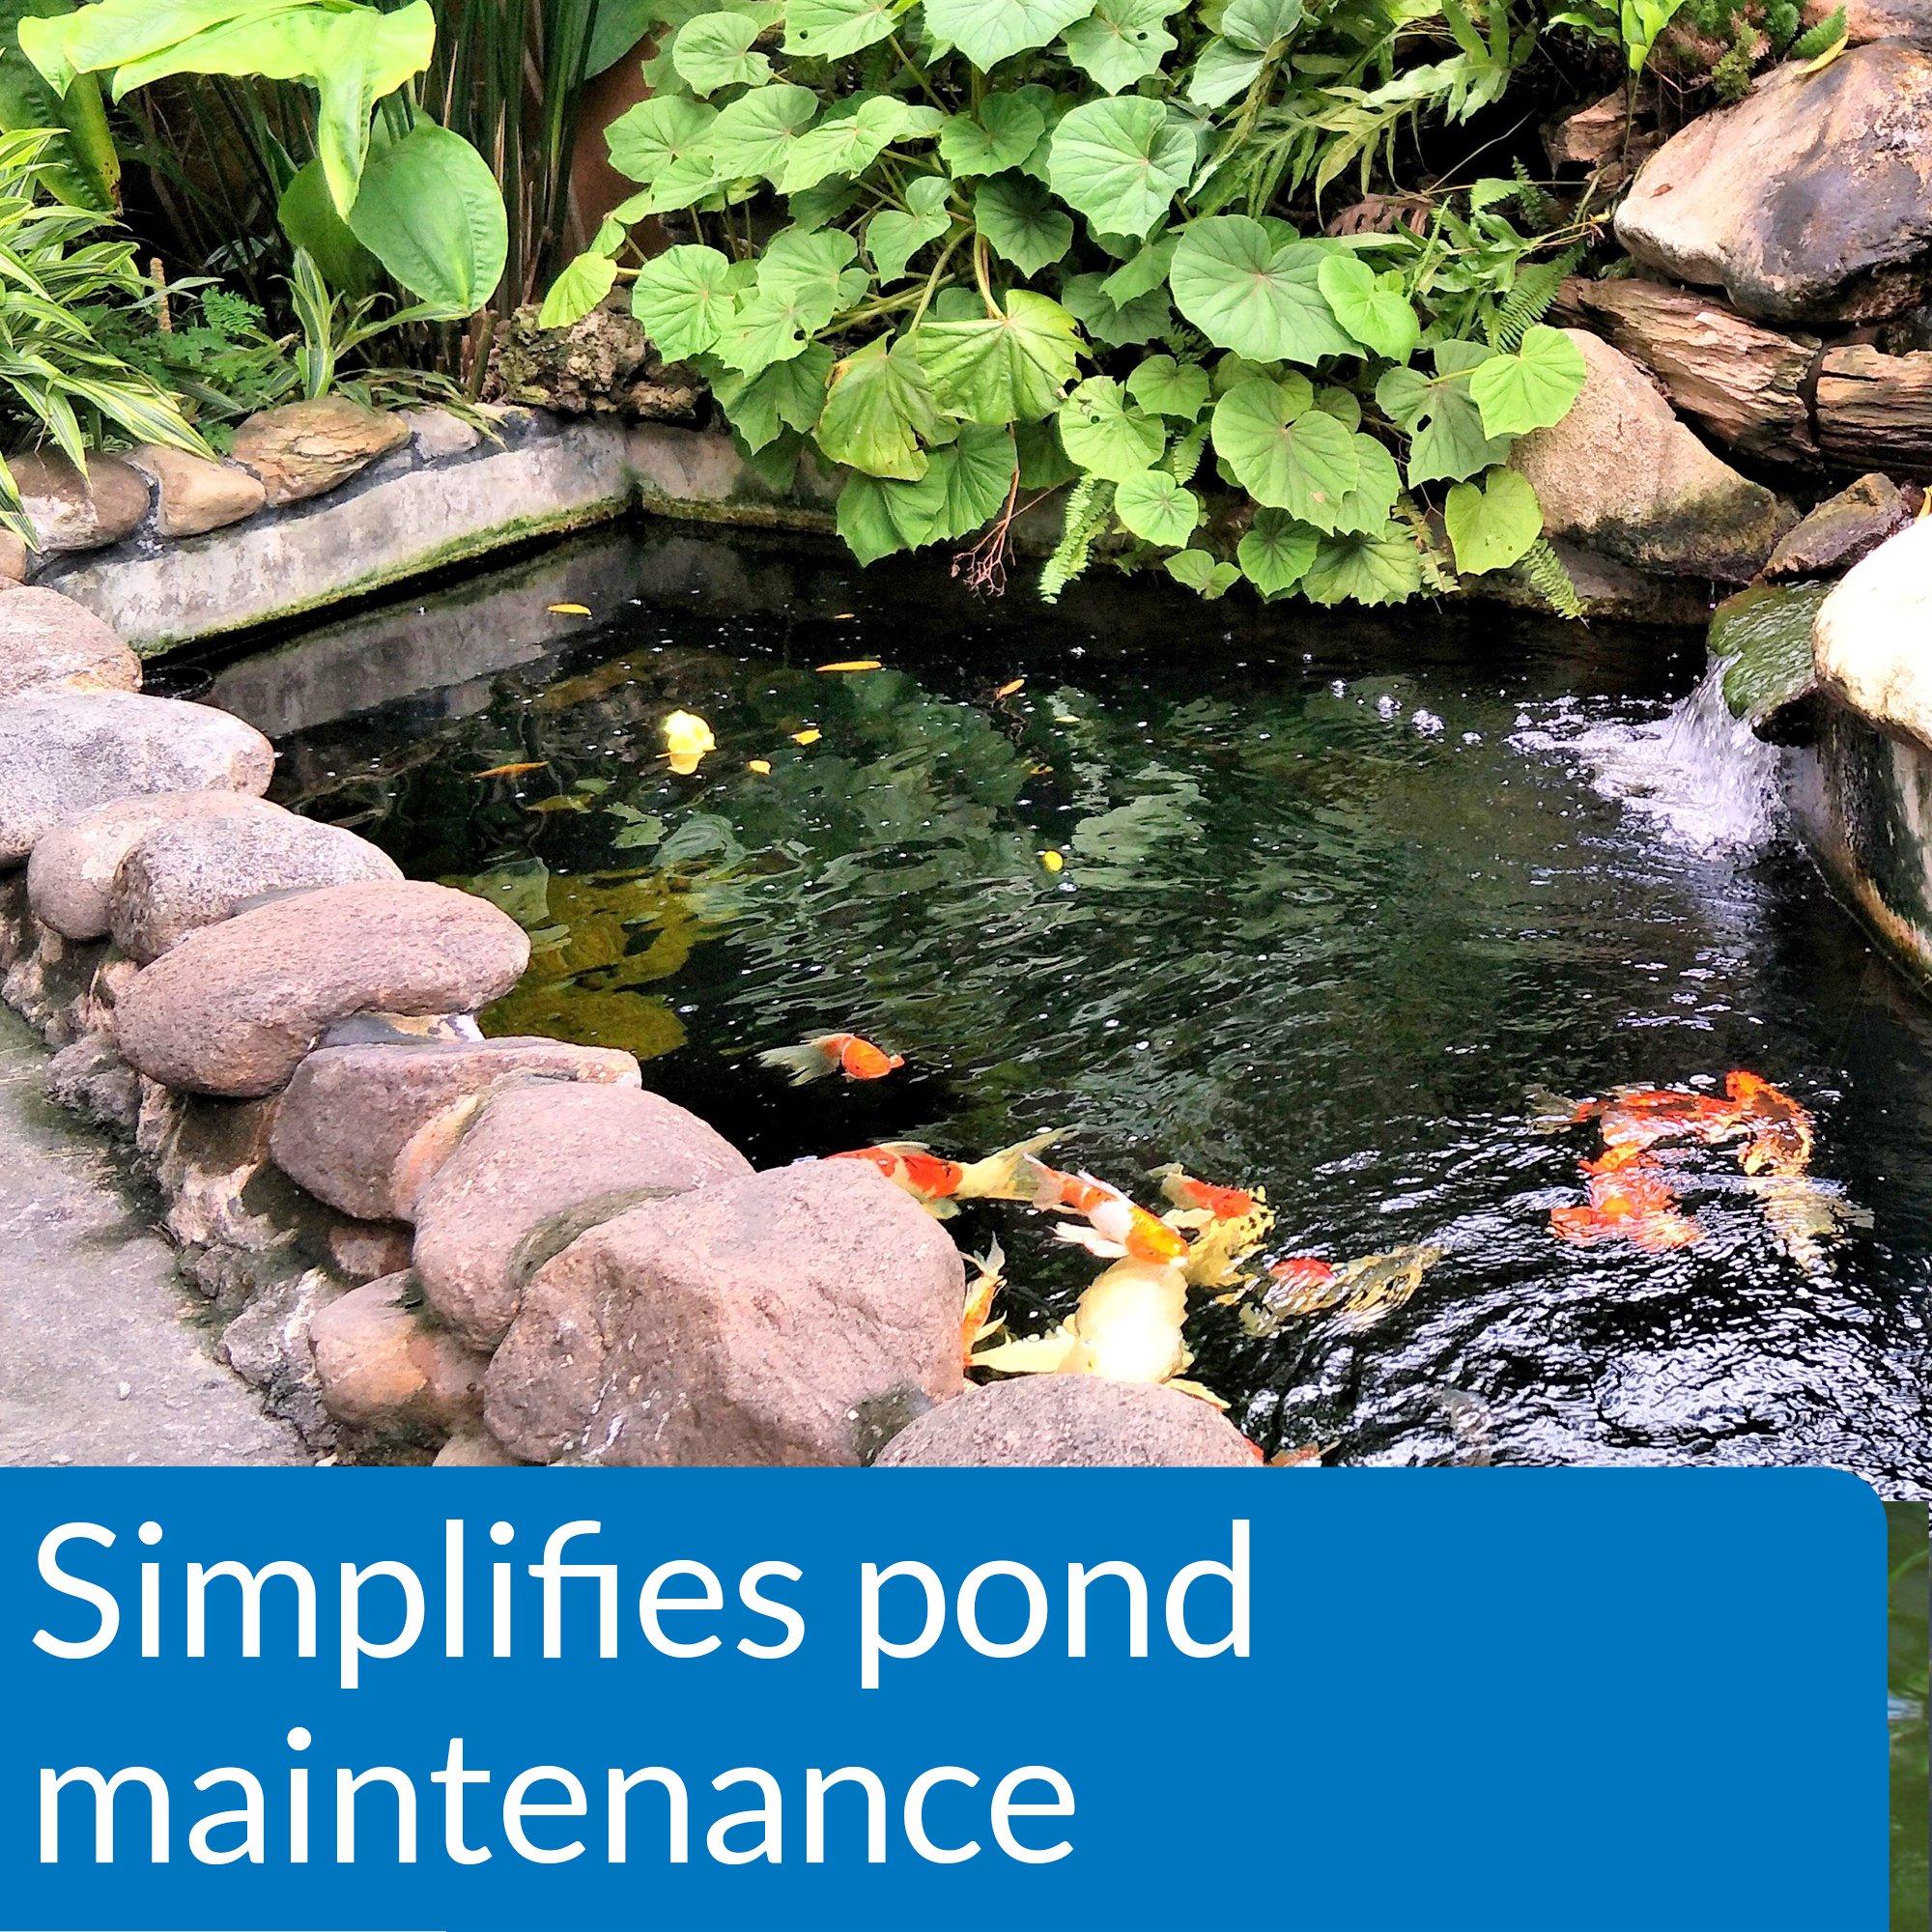 API POND ECOFIX SLUDGE DESTROYER Pond Water Clarifier and Sludge Remover Treatment 64-Ounce Bottle by API (Image #2)